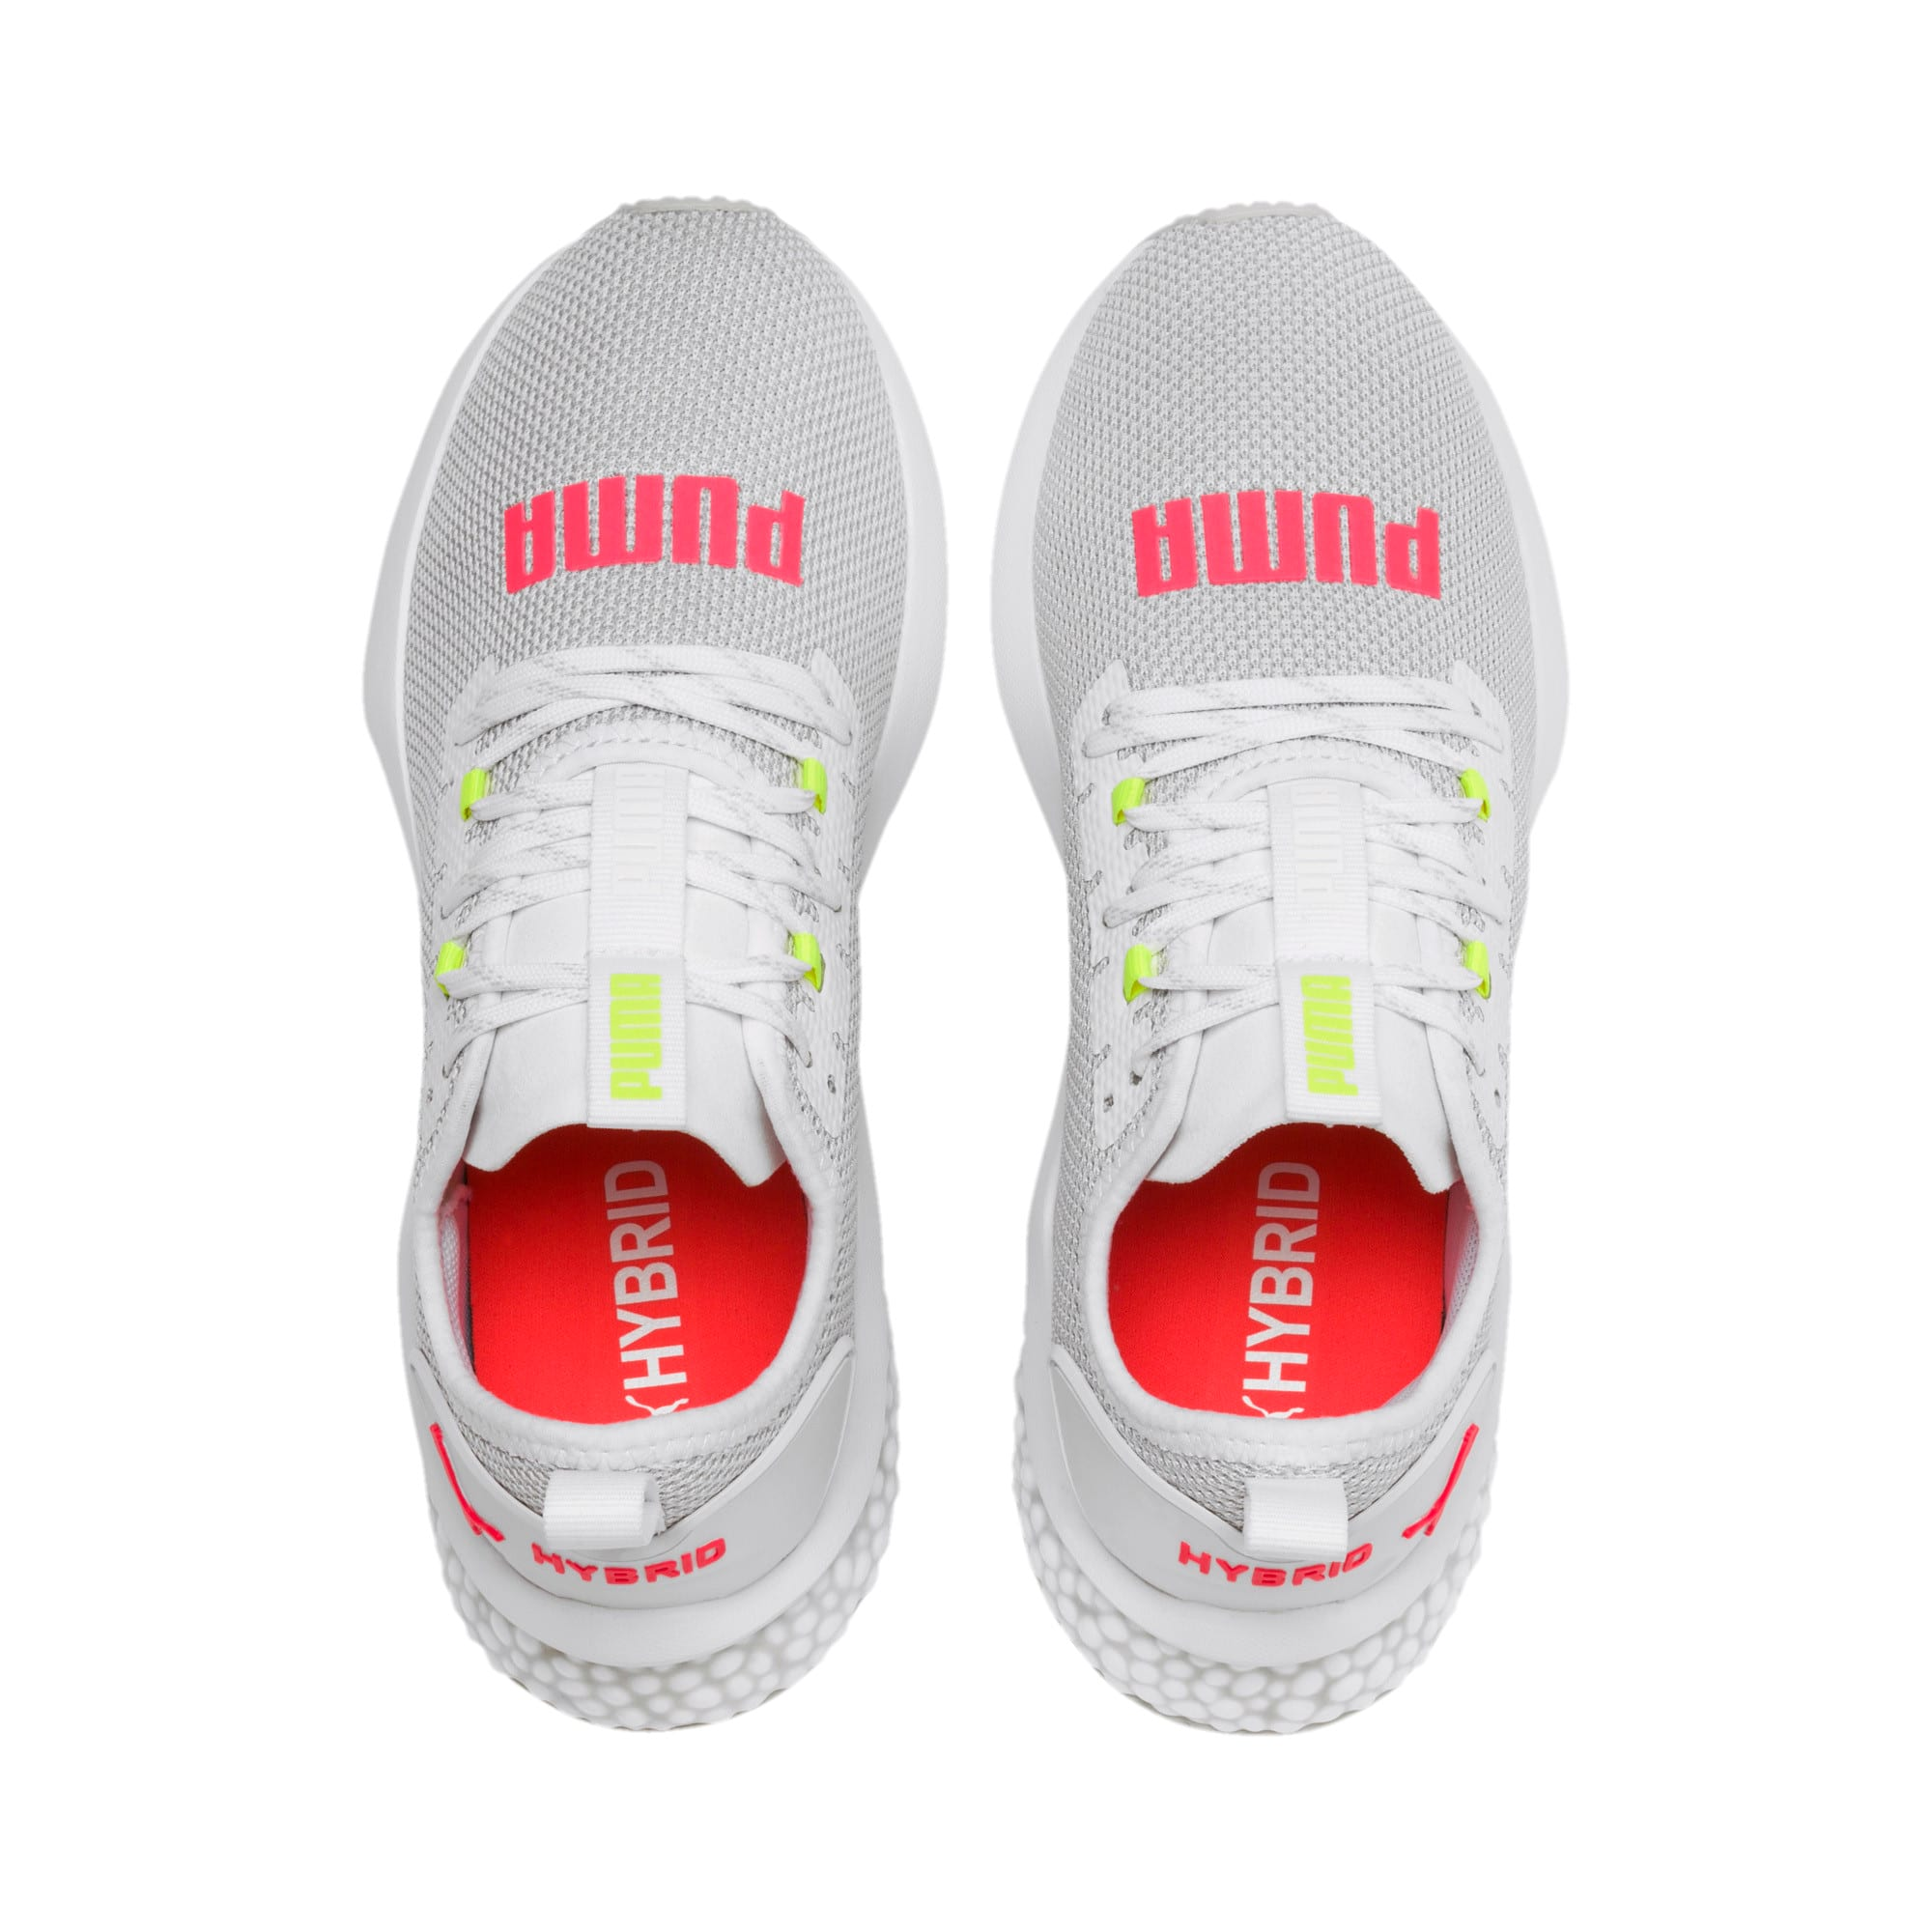 Thumbnail 7 of HYBRID NX Women's Running Shoes, Puma White-Pink Alert, medium